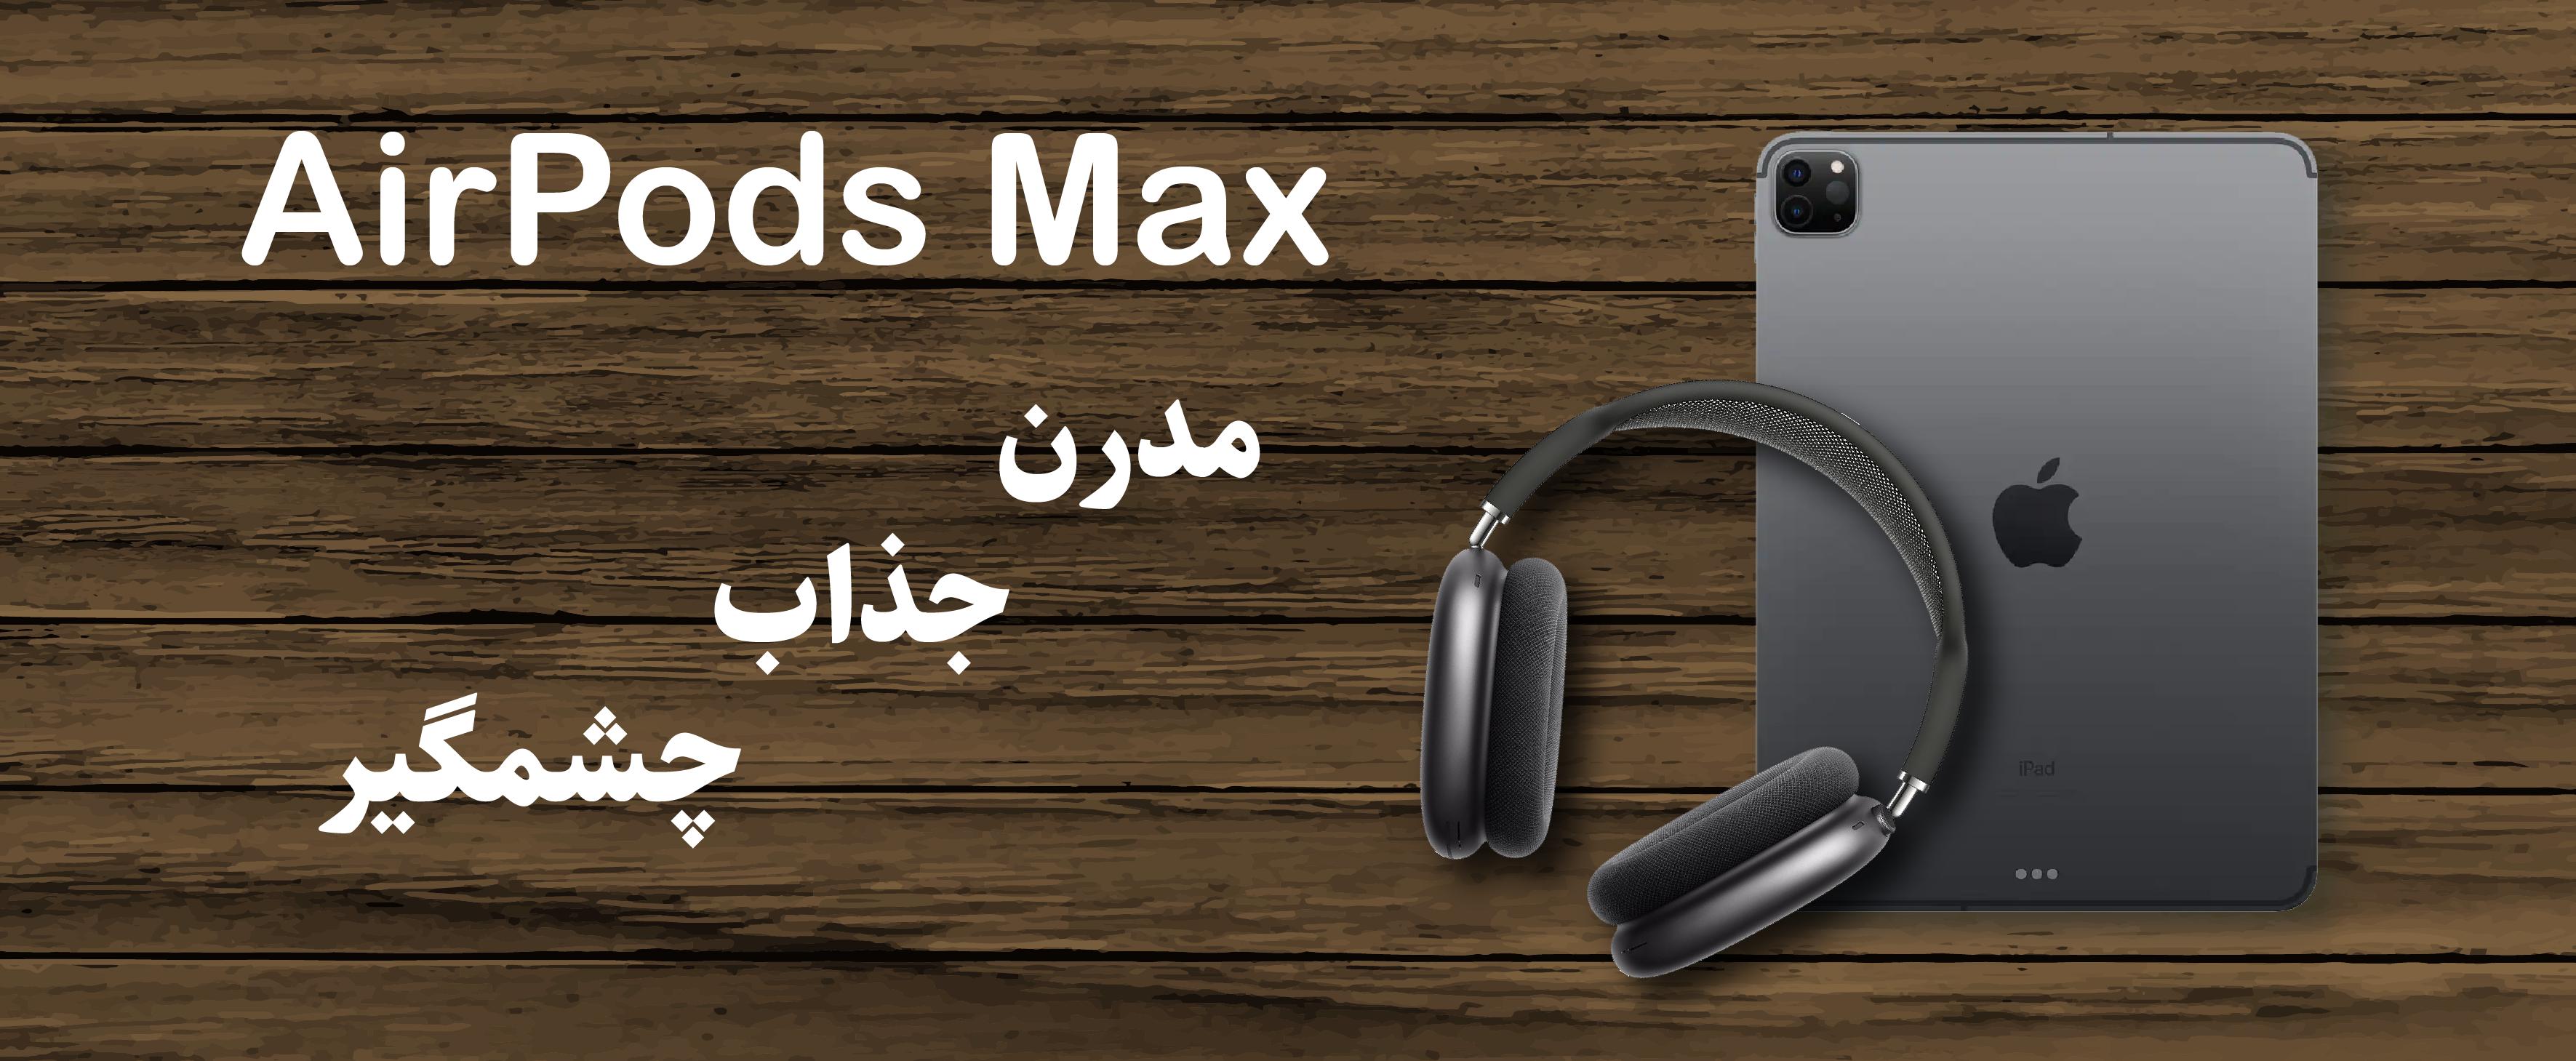 خرید اقساطی هدفون بلوتوثی اپل مدل AirPods Max